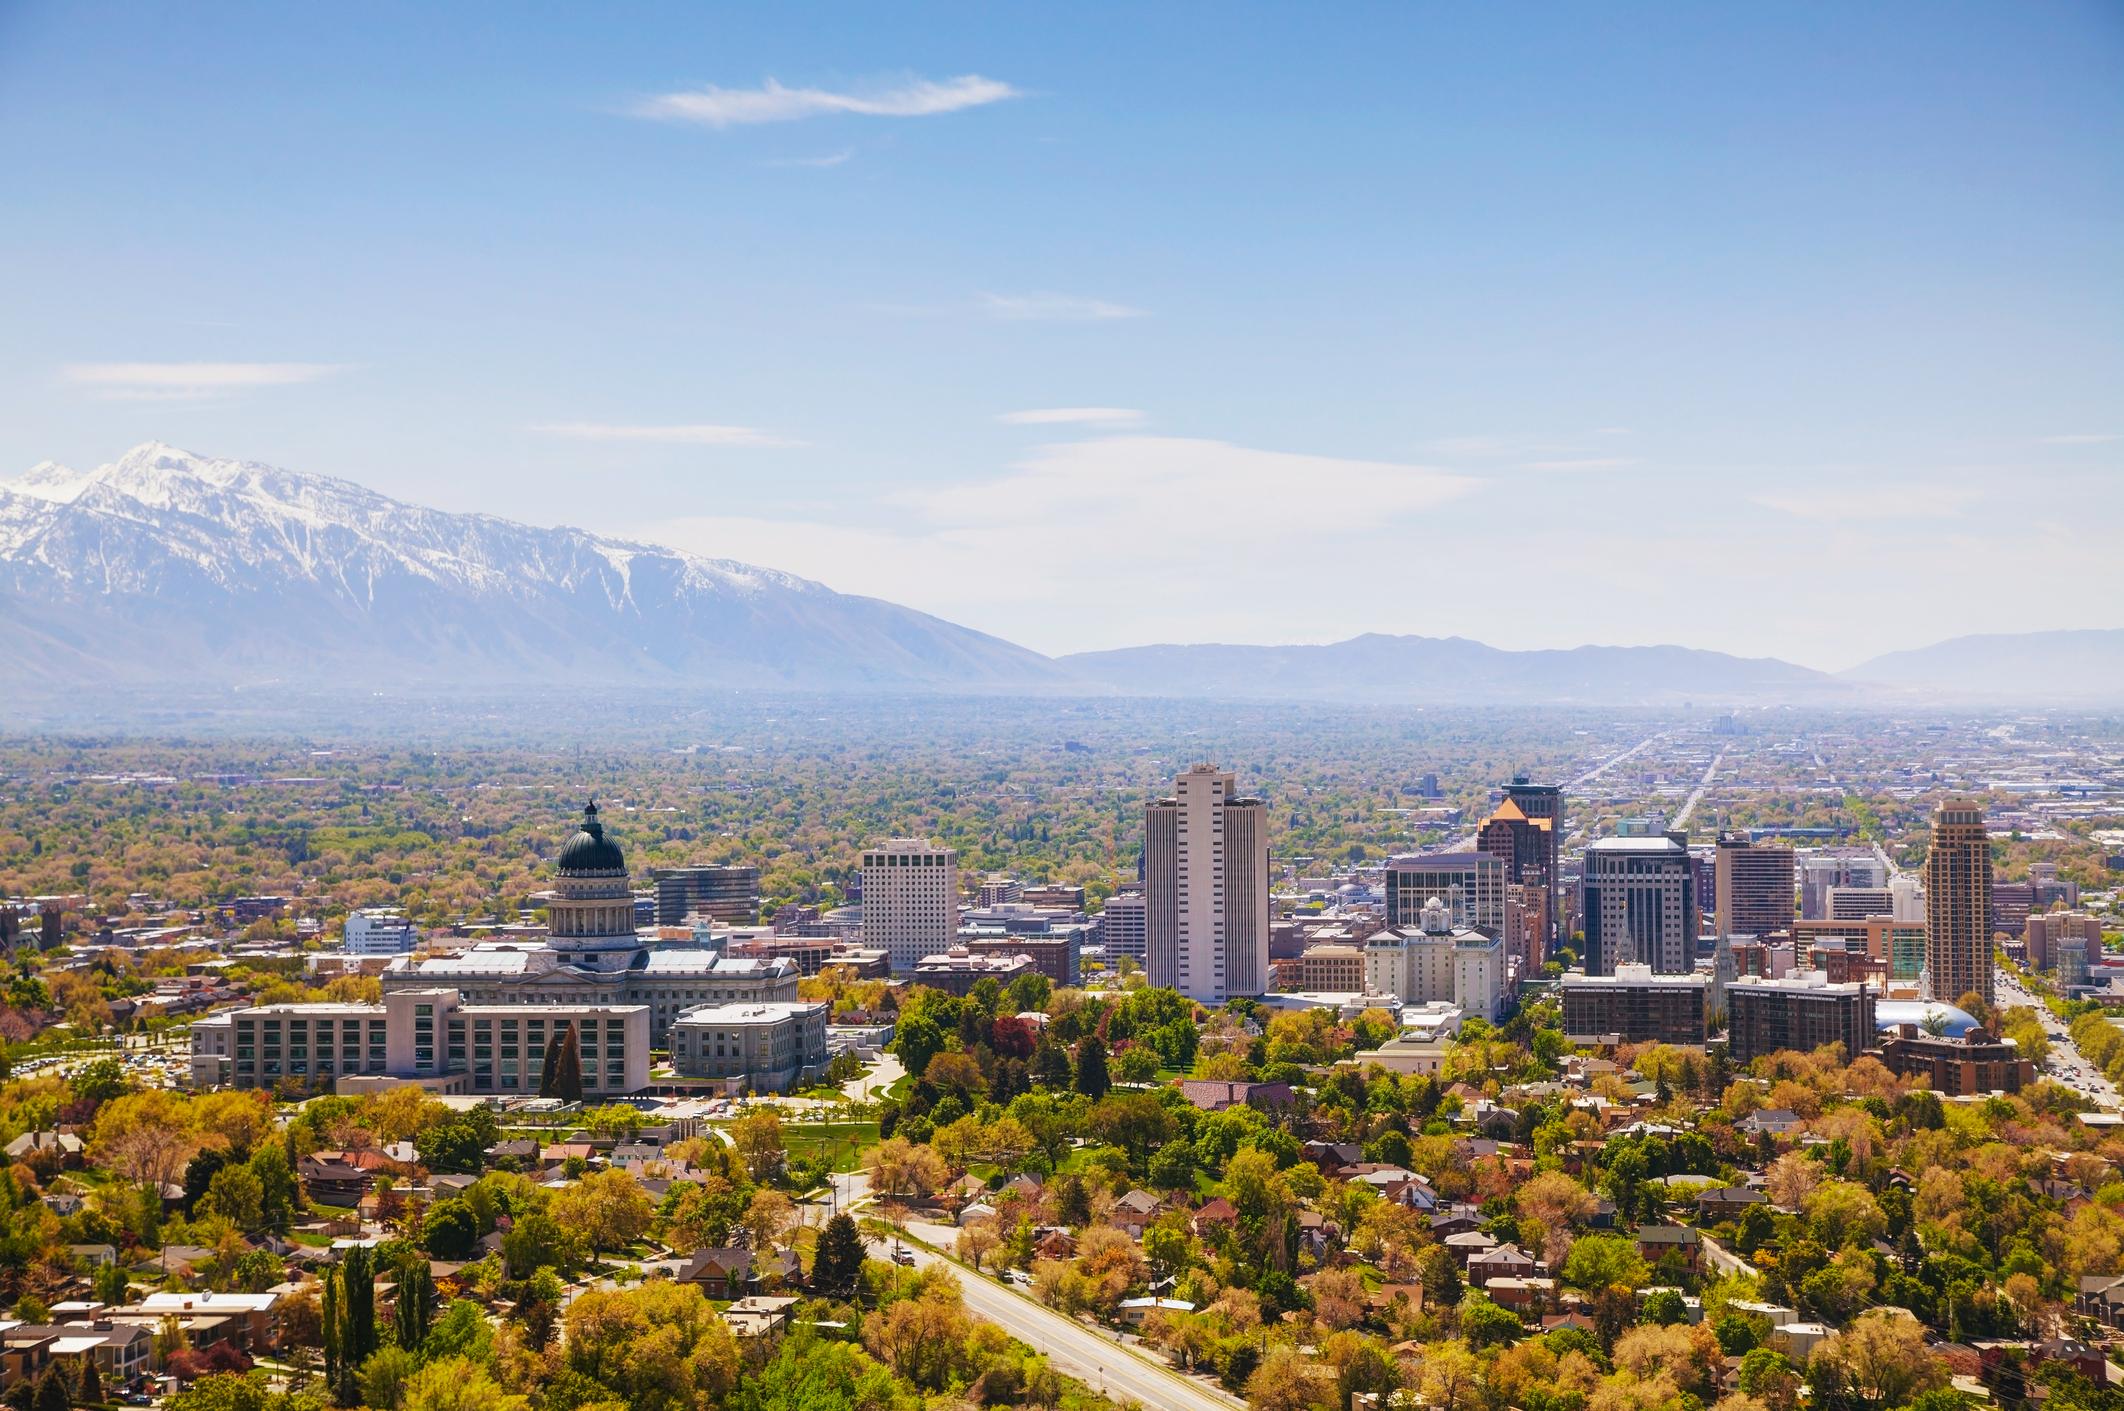 Sound Booth - Salt Lake City, UT